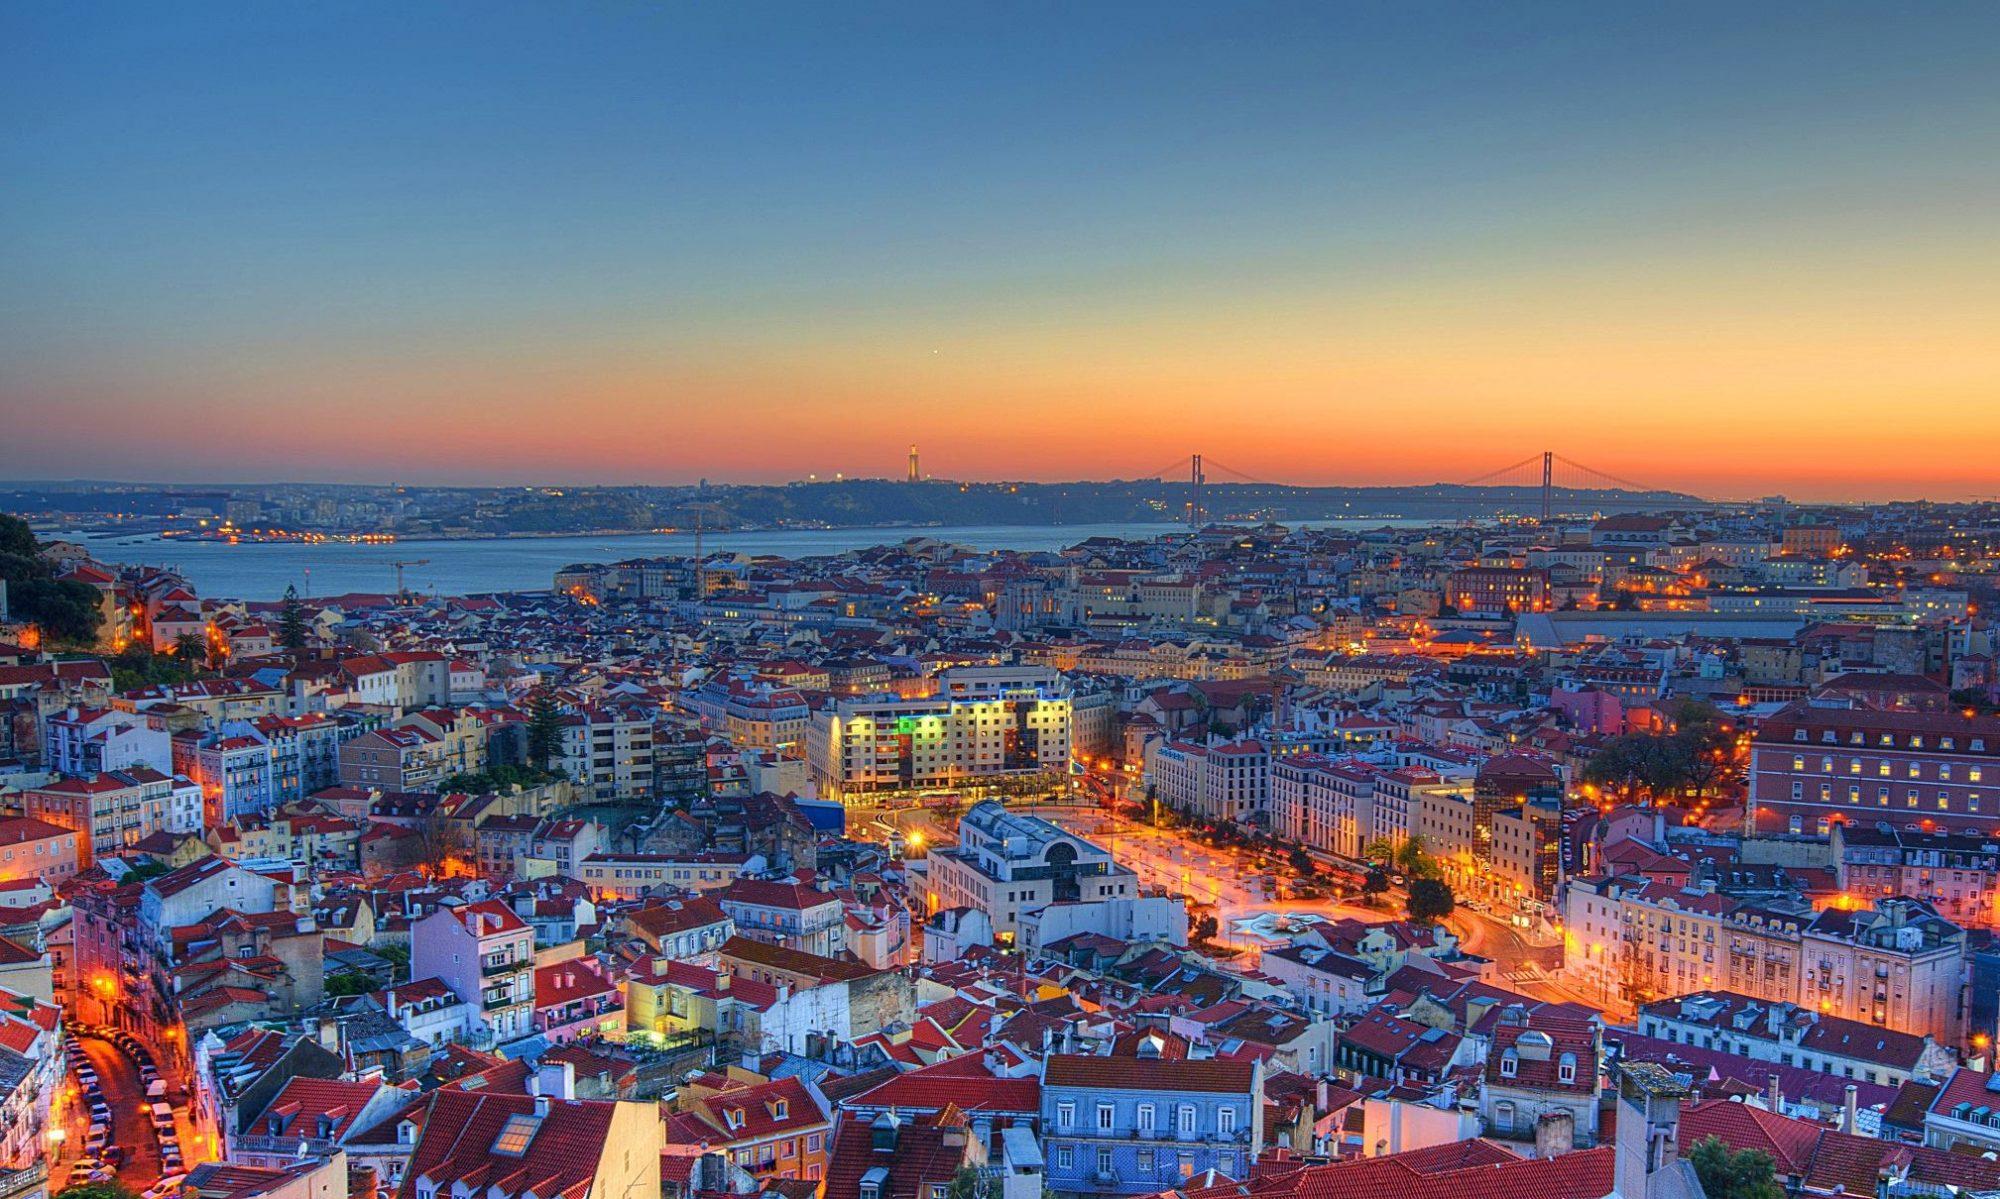 UESPT - Portugal